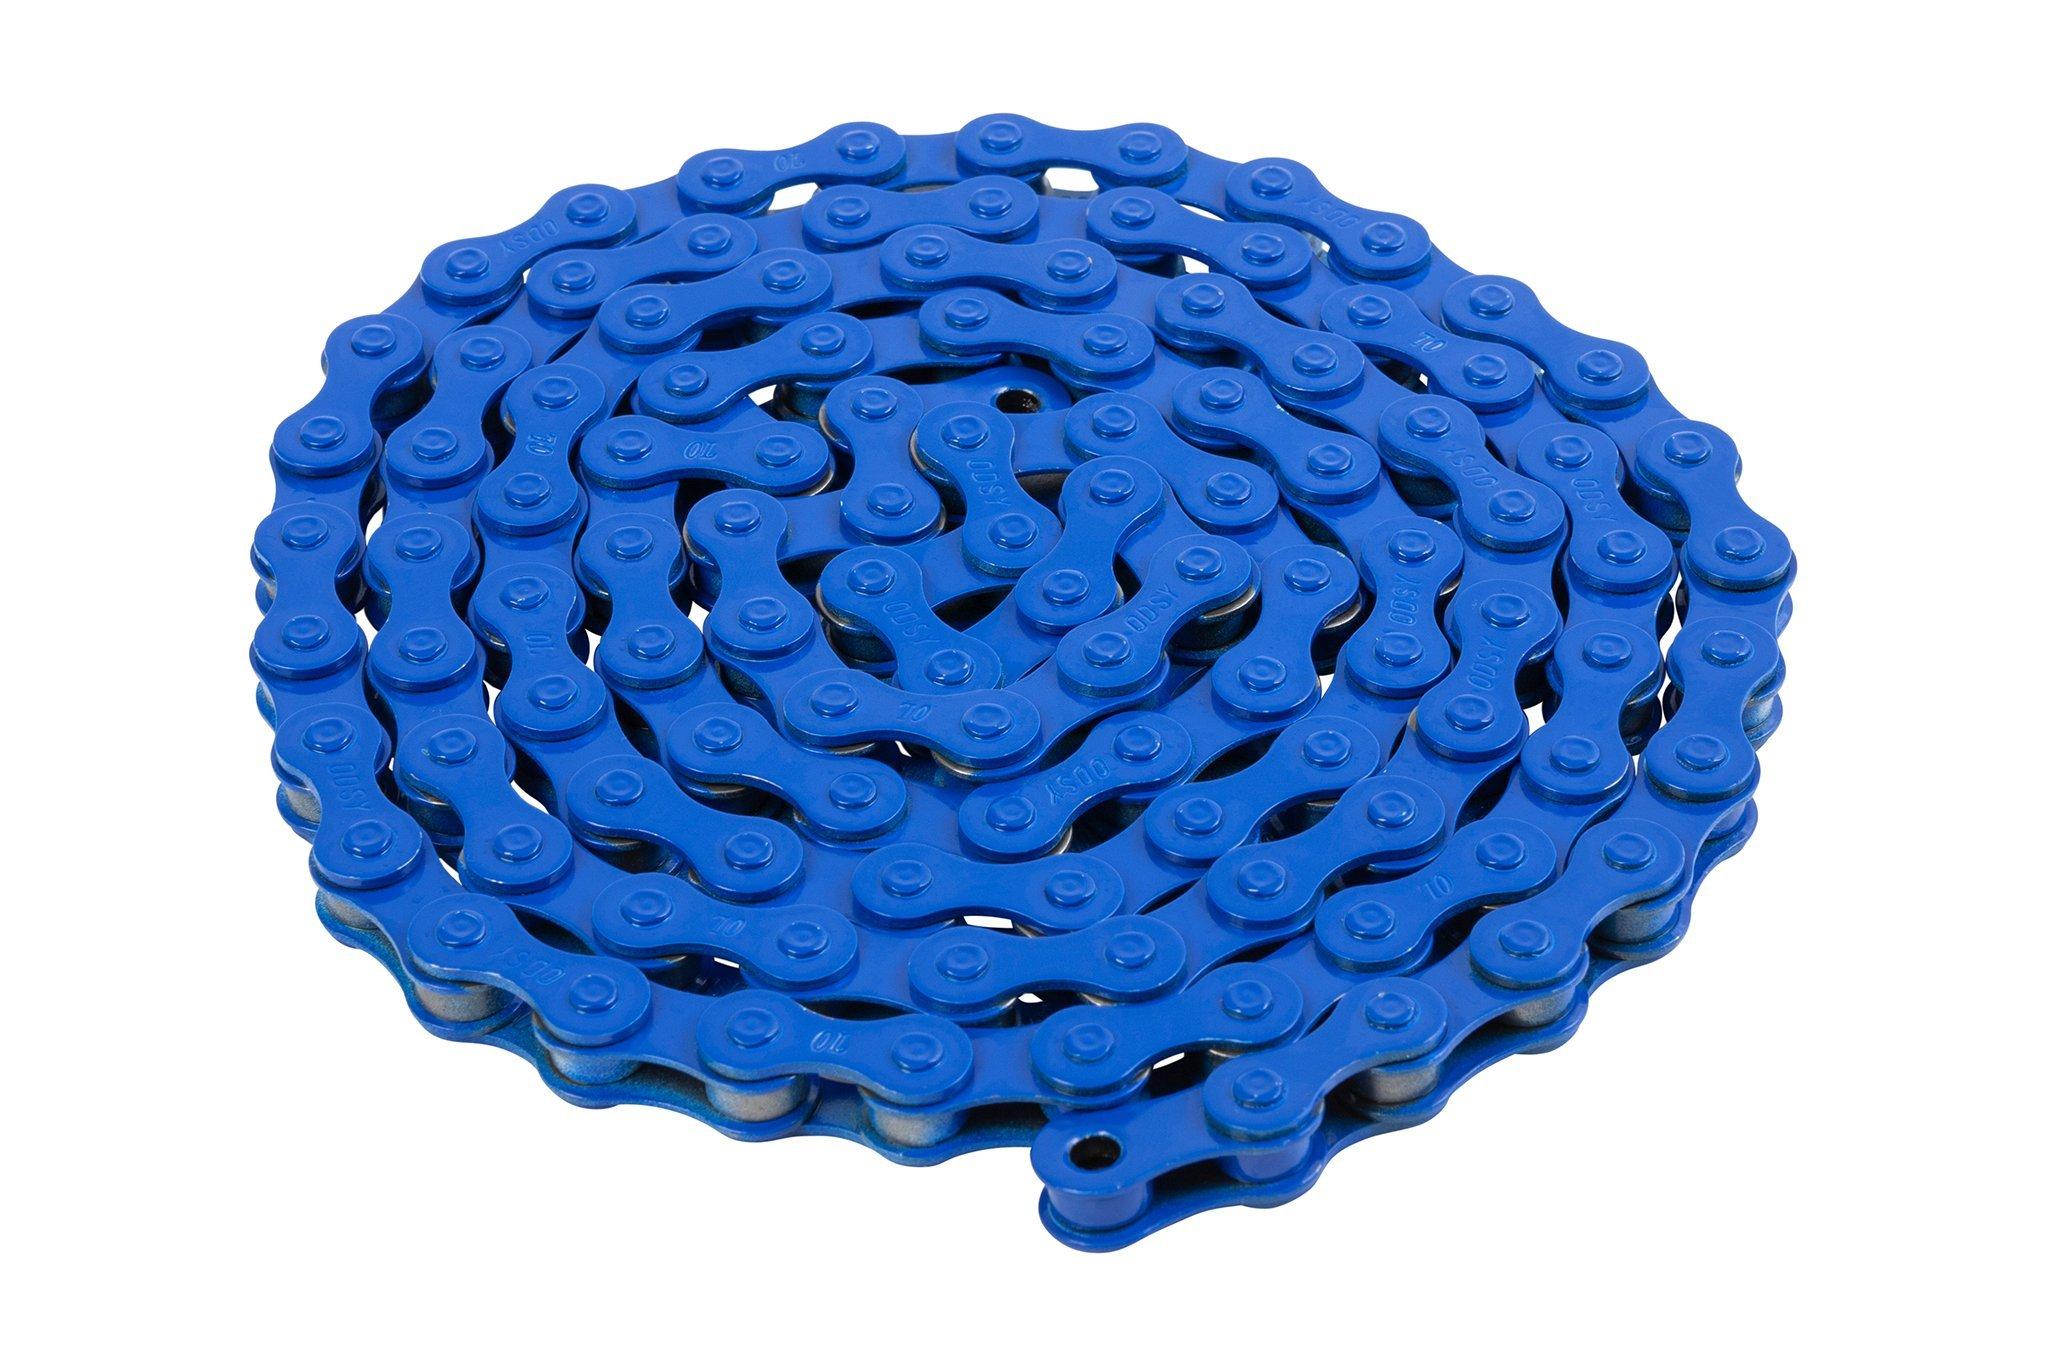 ODSY-Bluebird-Chain-Blue-3Q-Web_2048x2048